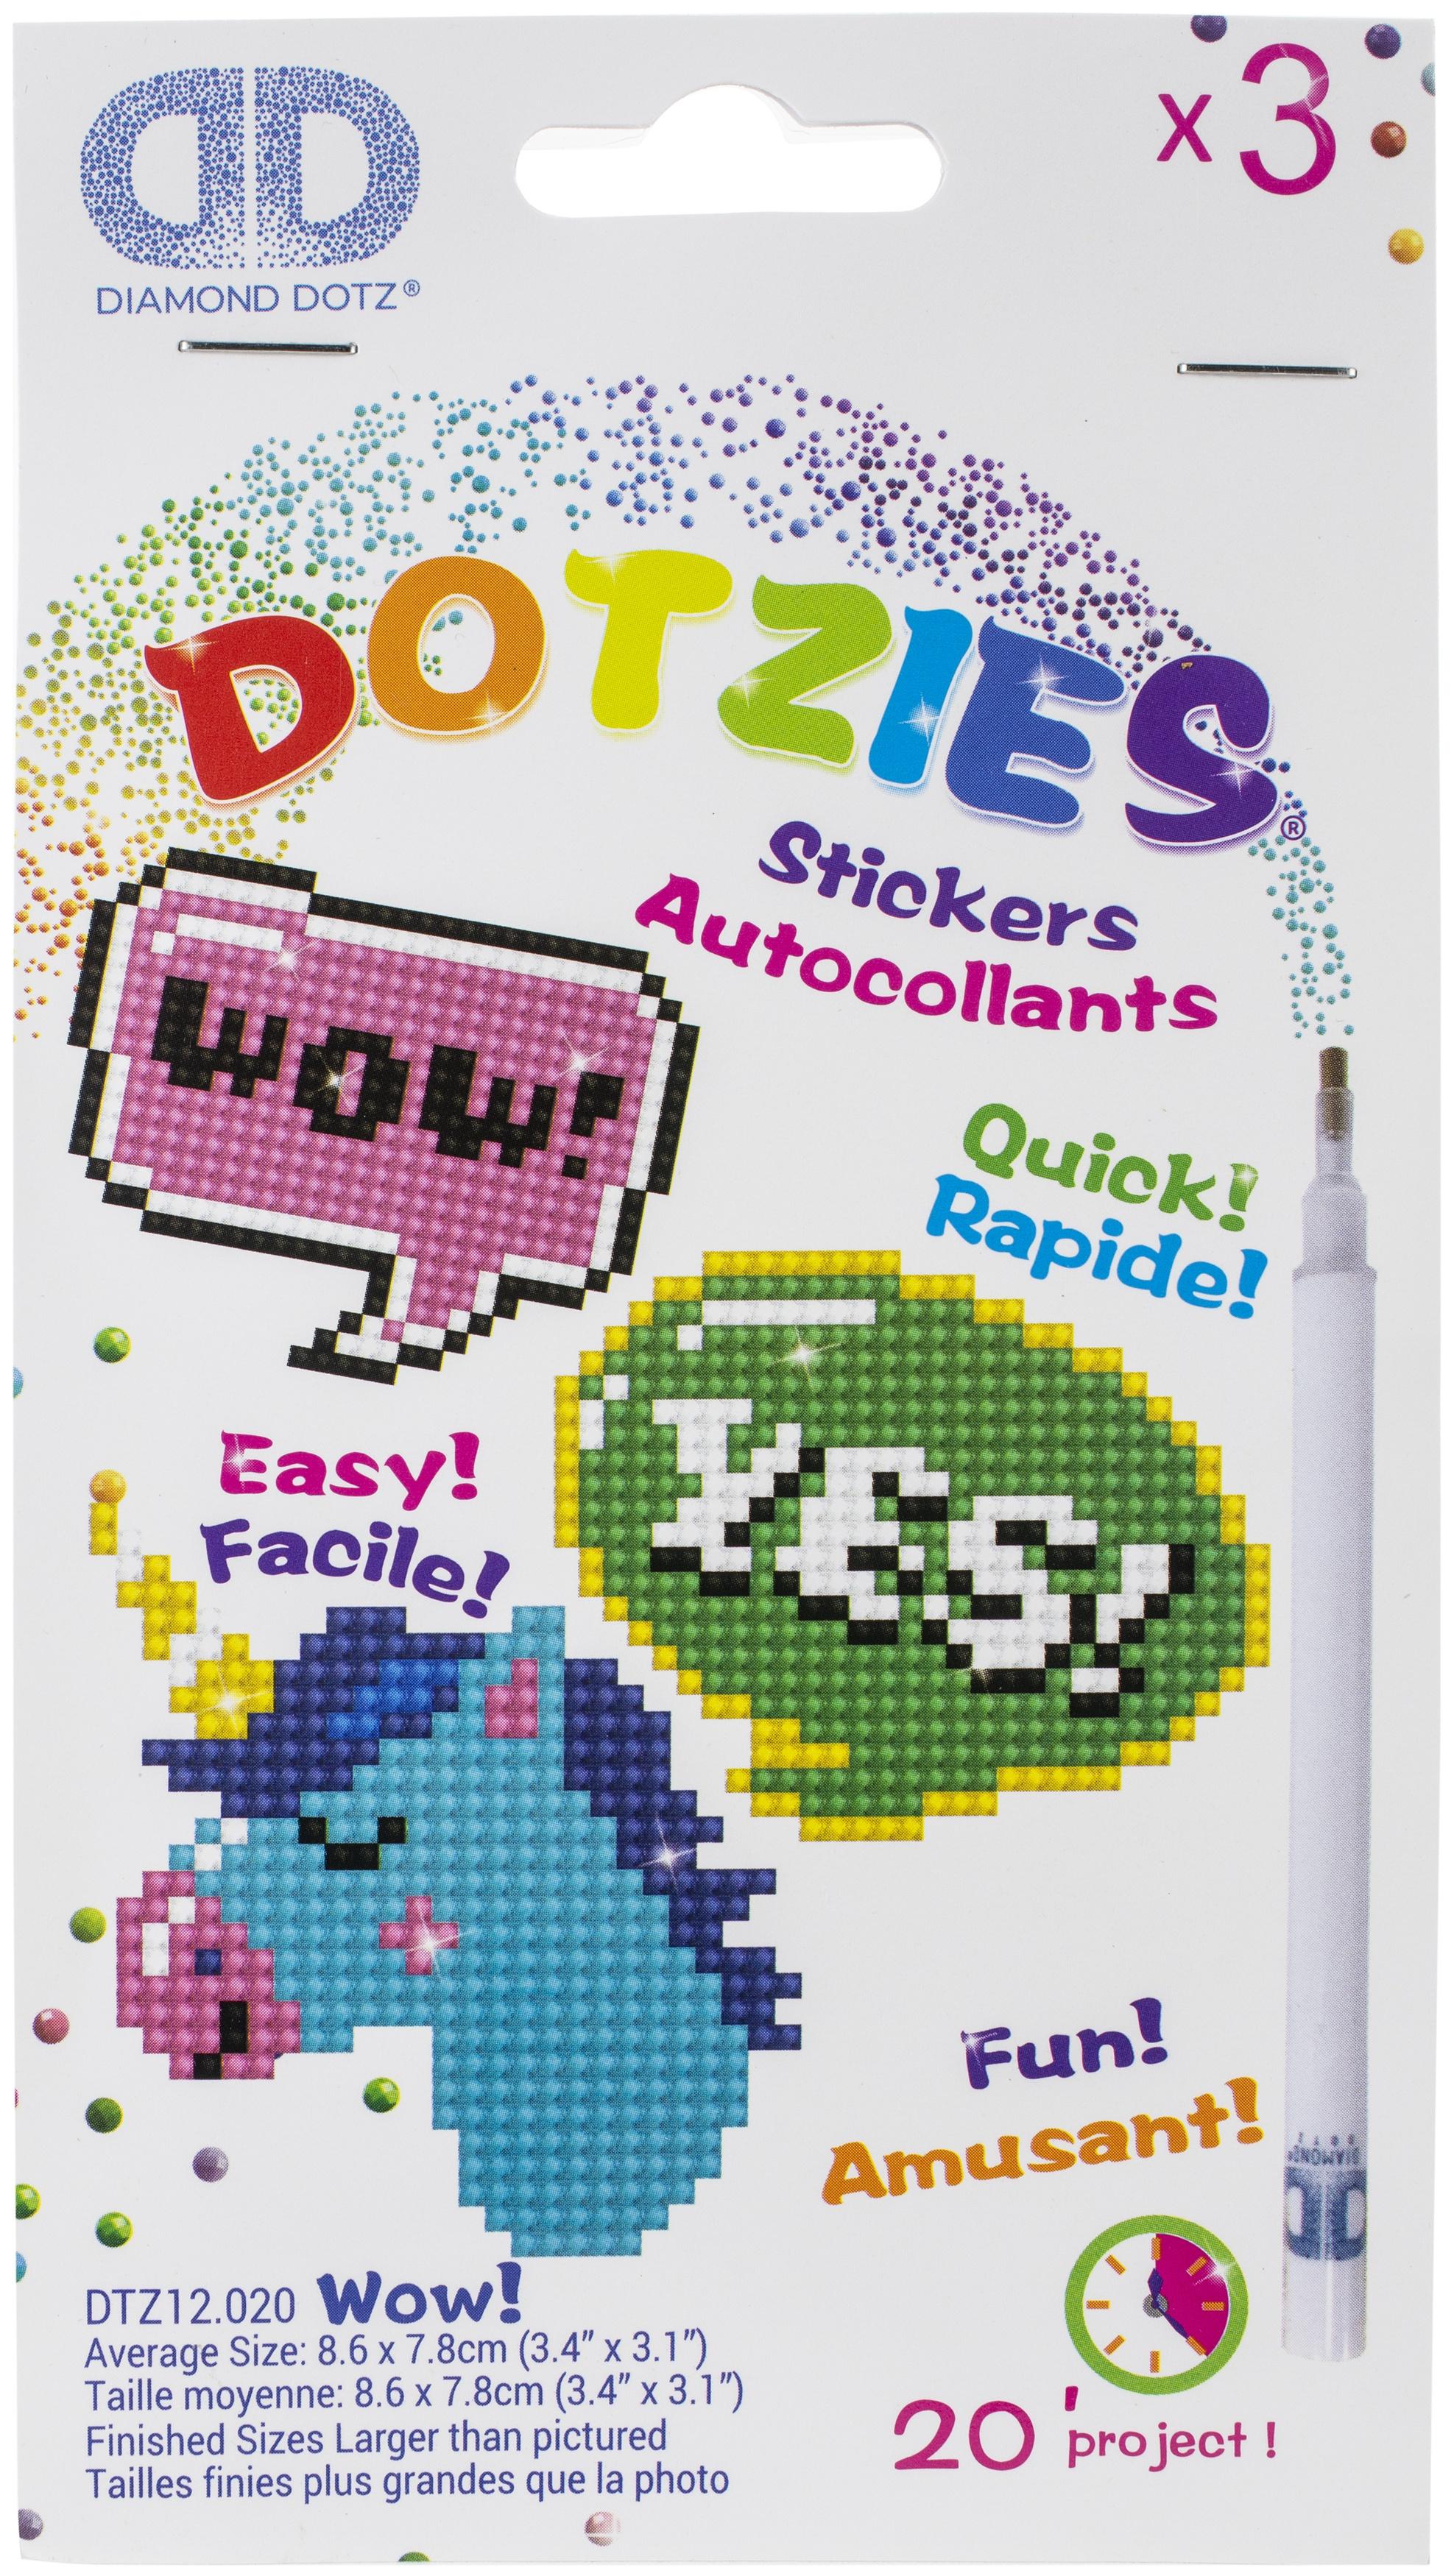 Diamond Dotz DOTZIES Stickers Facet Art Kit-Multi Pack Wow 3/Pkg